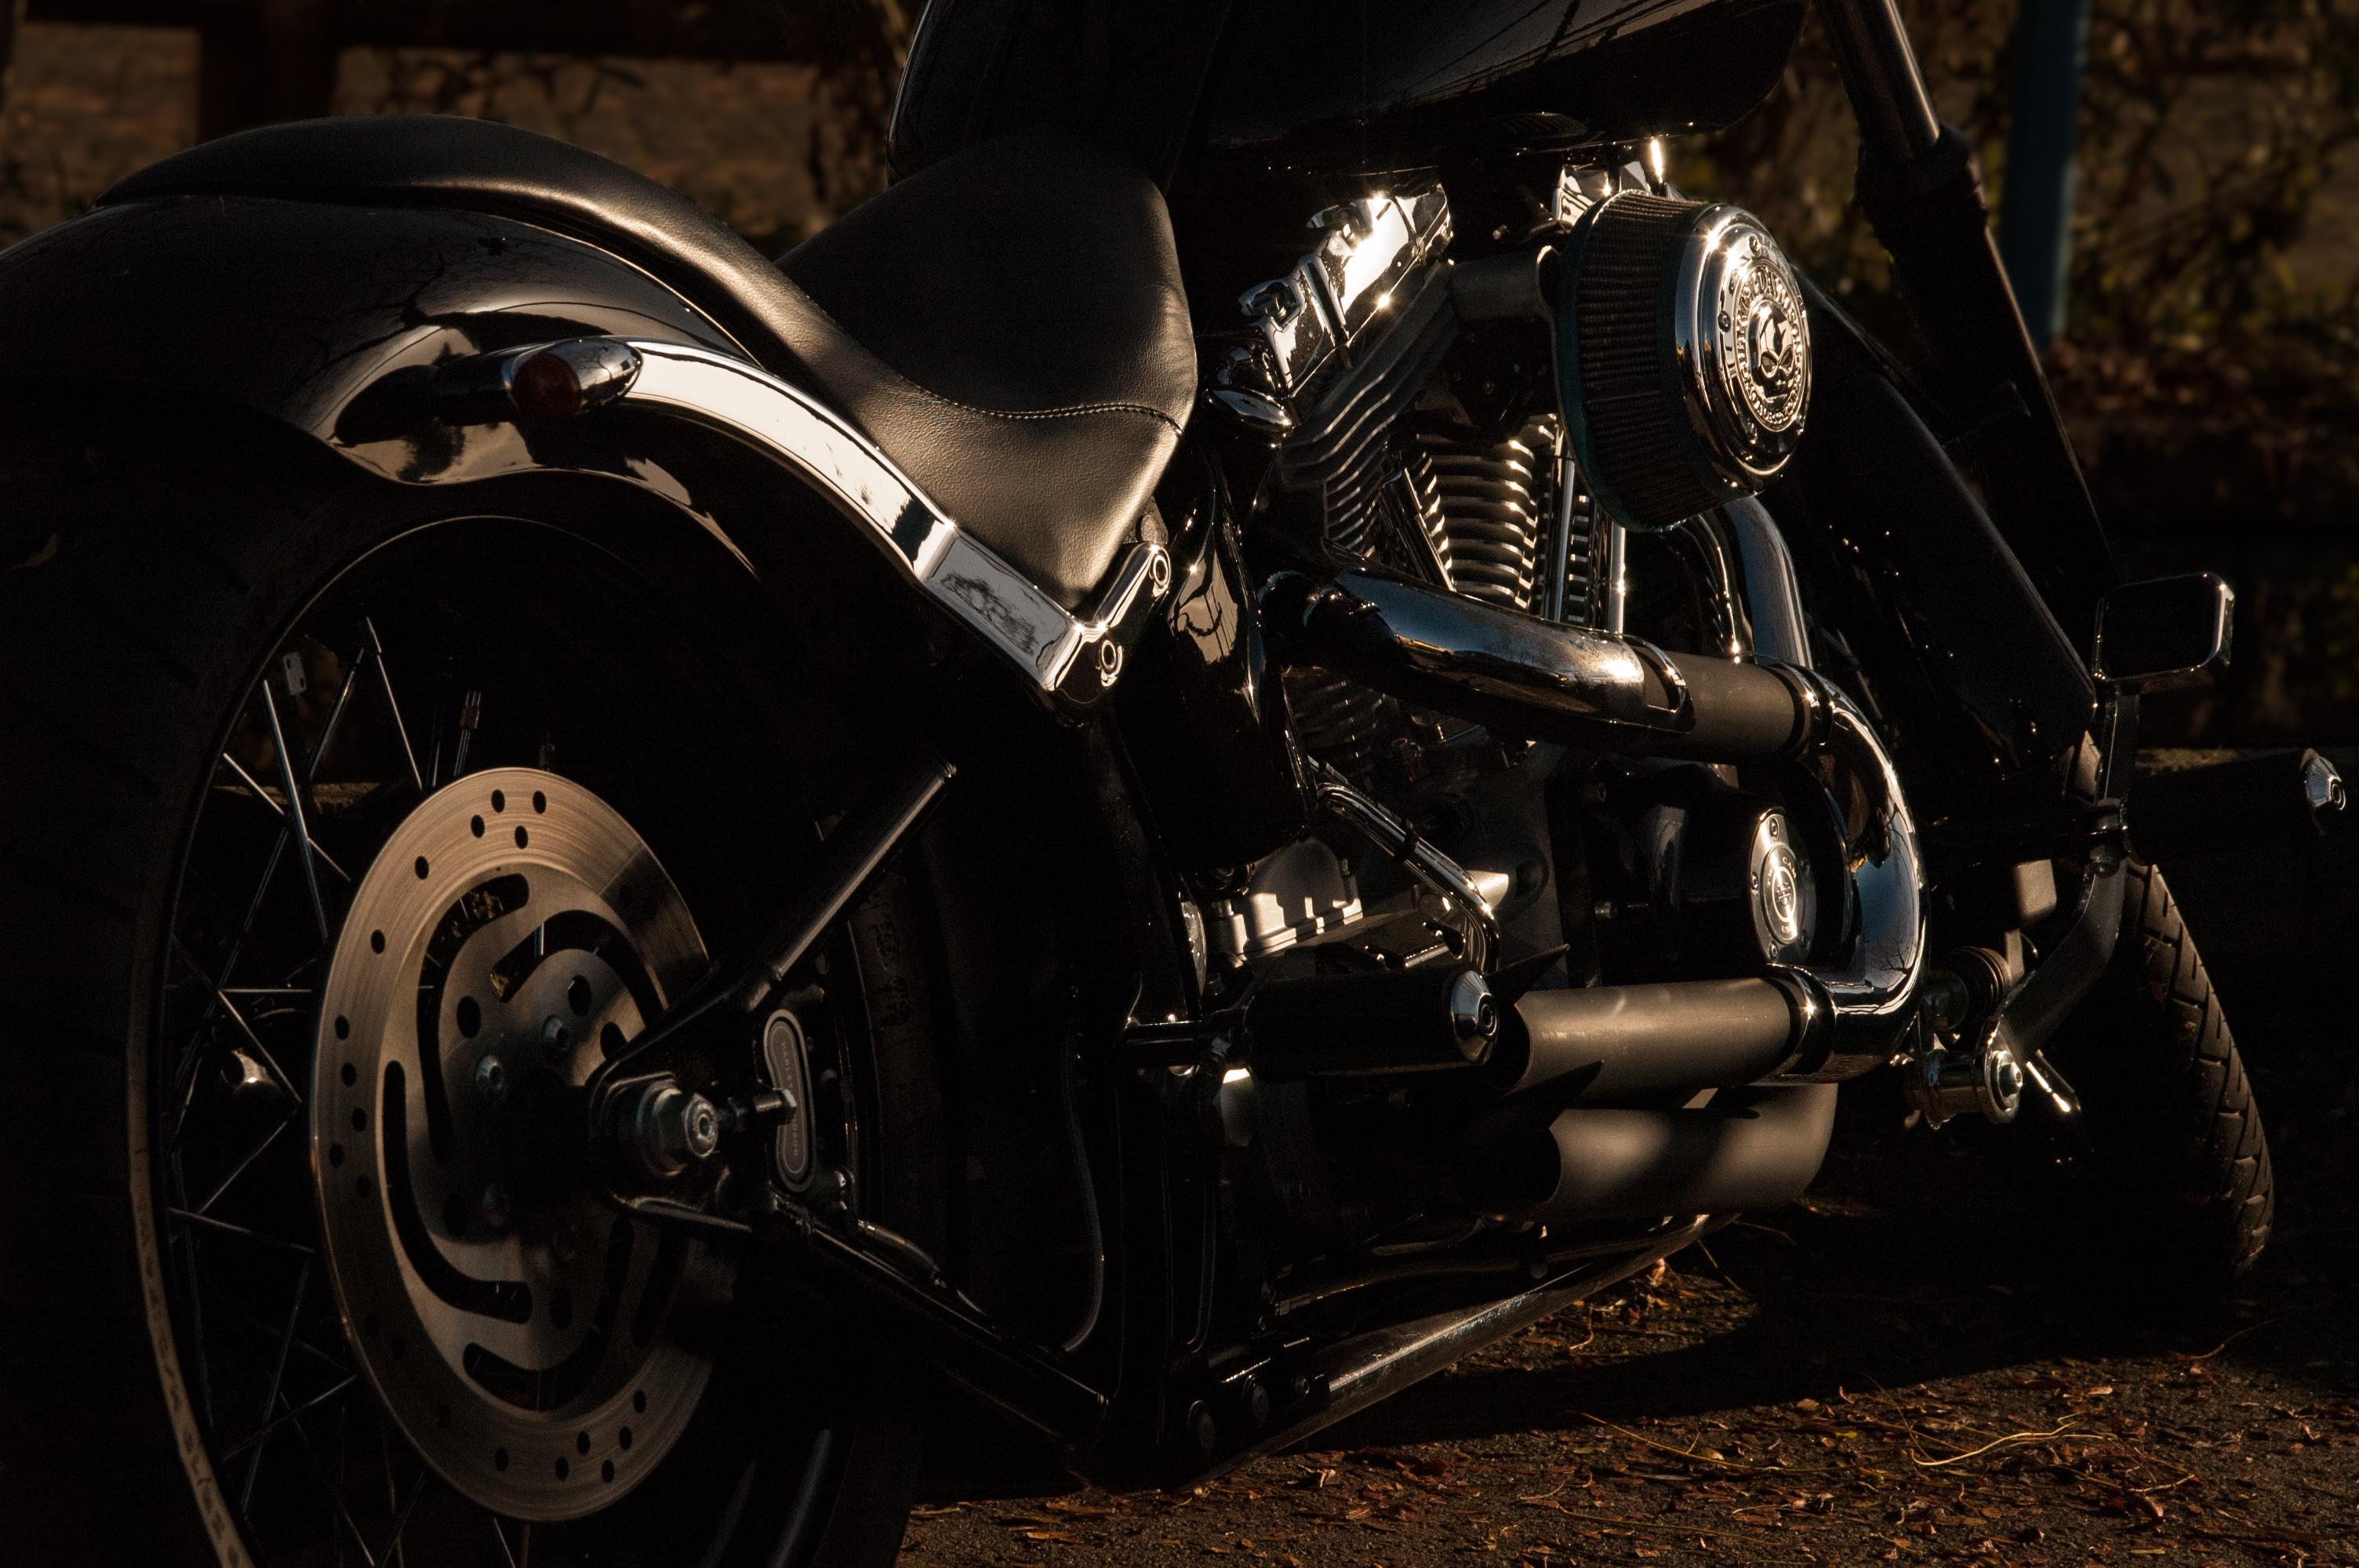 voyeur-black-biker-wants